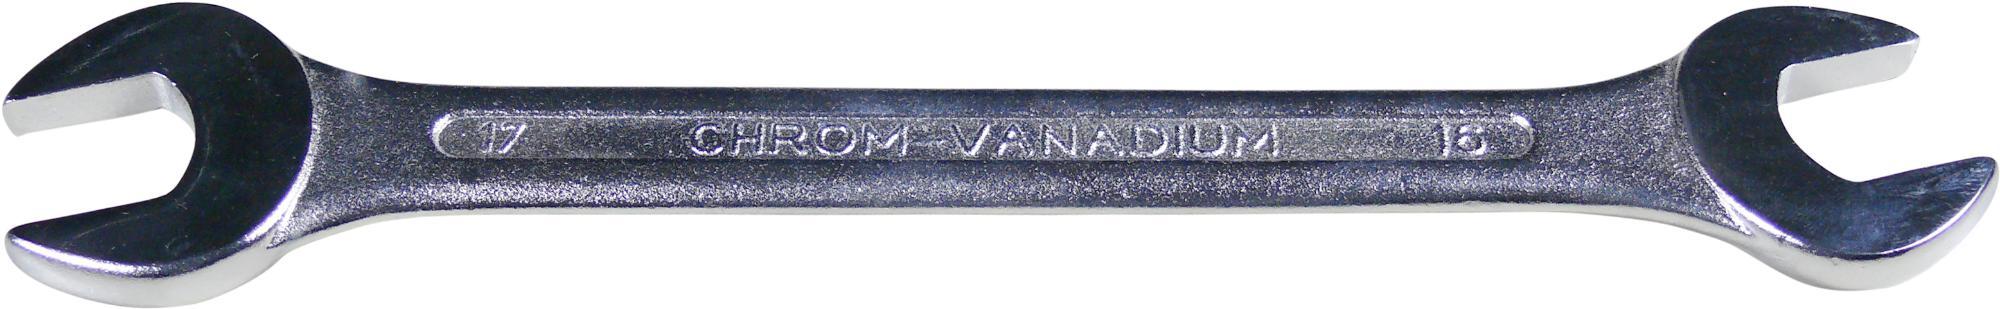 Kľúč vidlica-vidlica, 6x7 mm